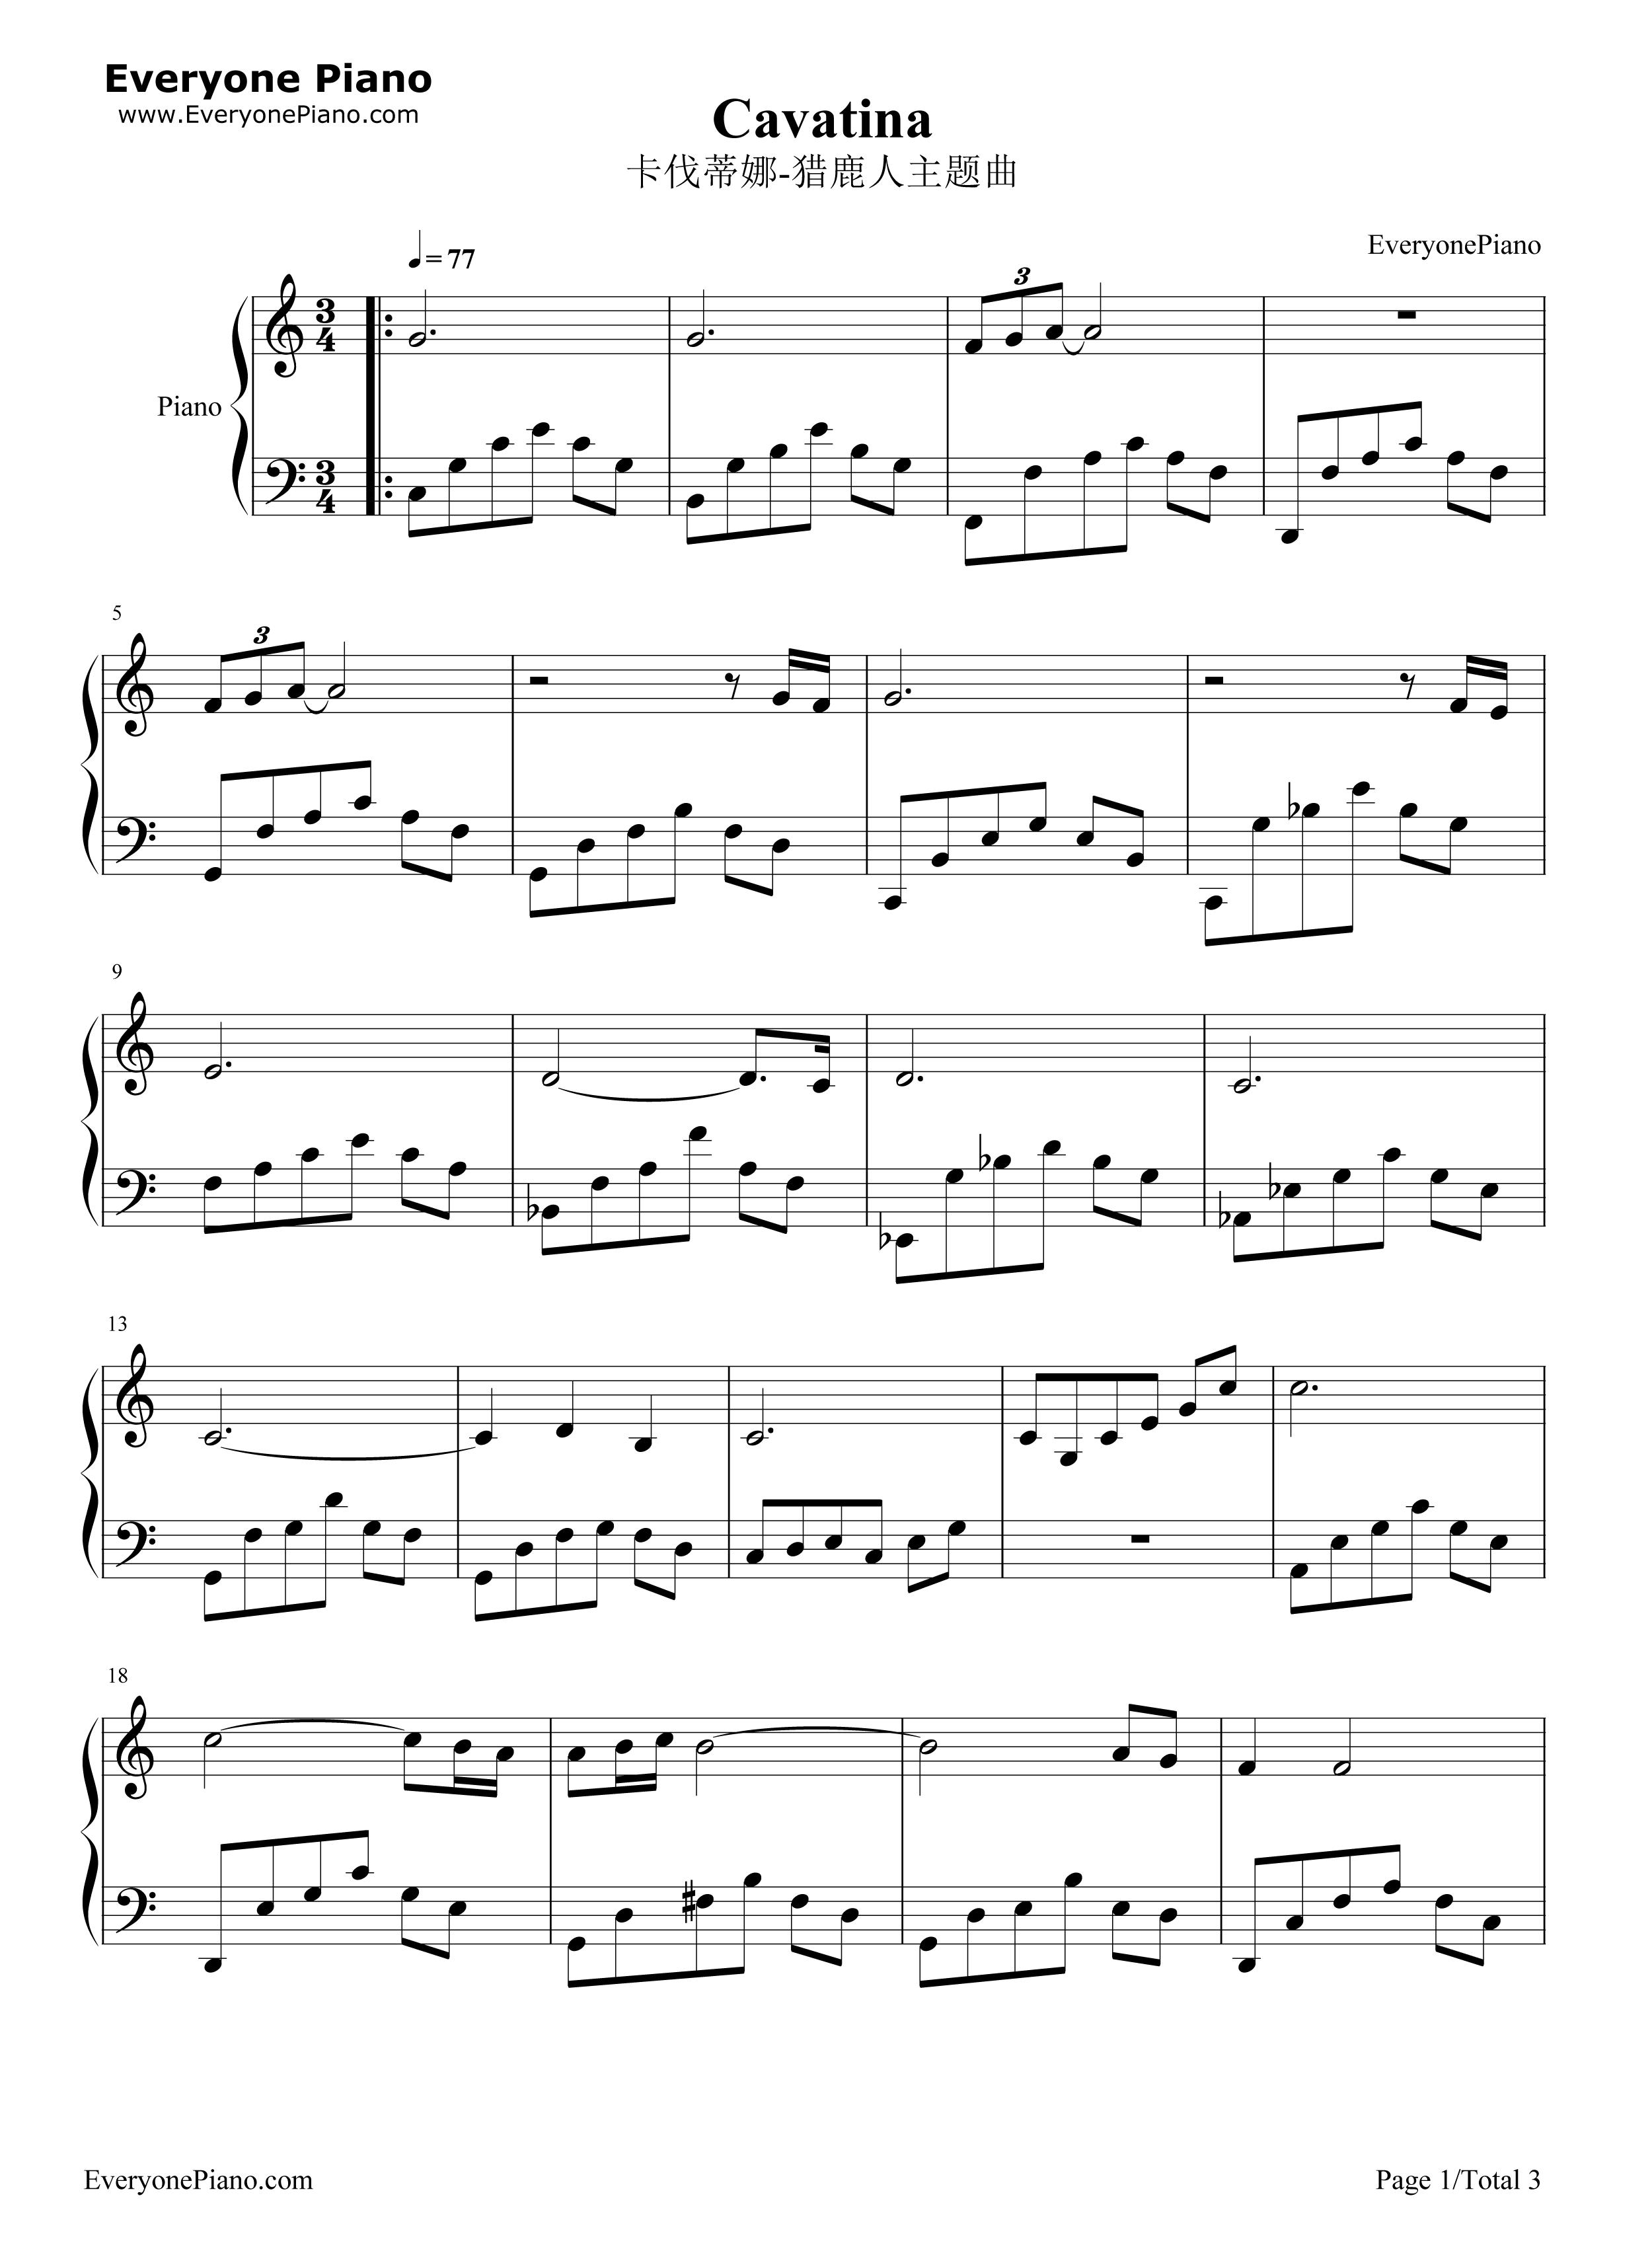 cavatina sheet music